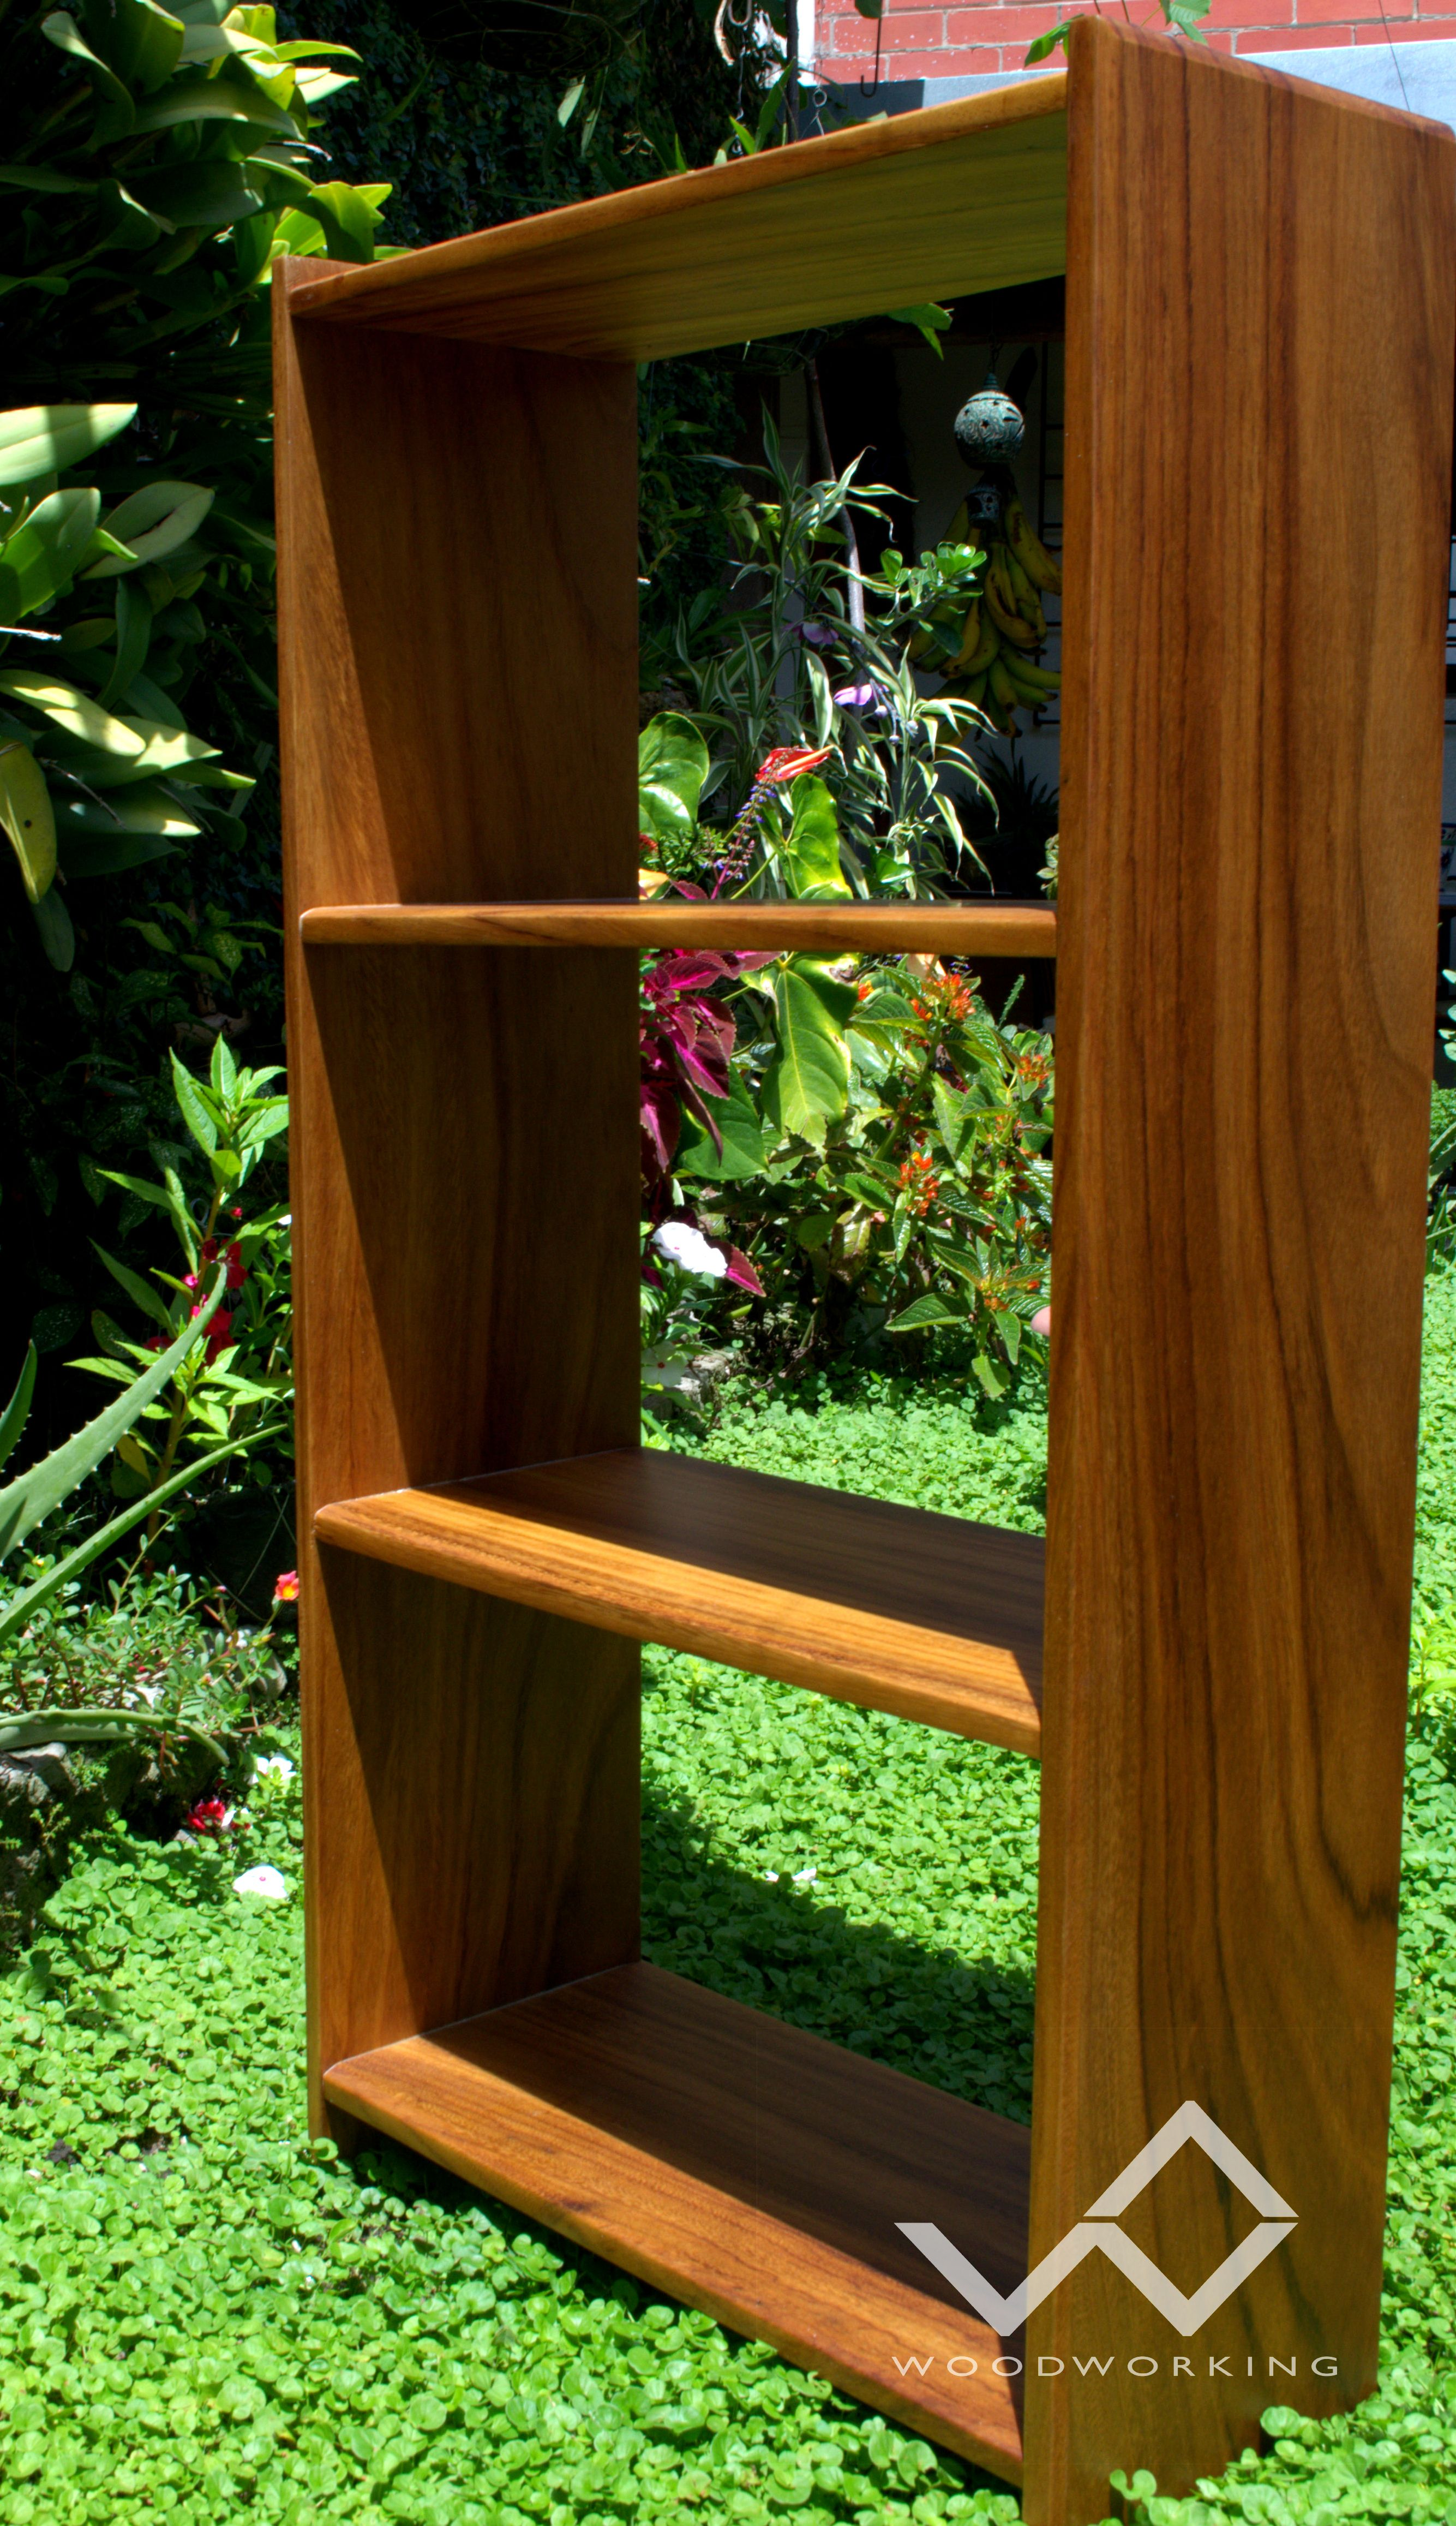 Librera #Conacaste #Madera #Bookshelf #Wood #Furniture #Muebles #W&A #